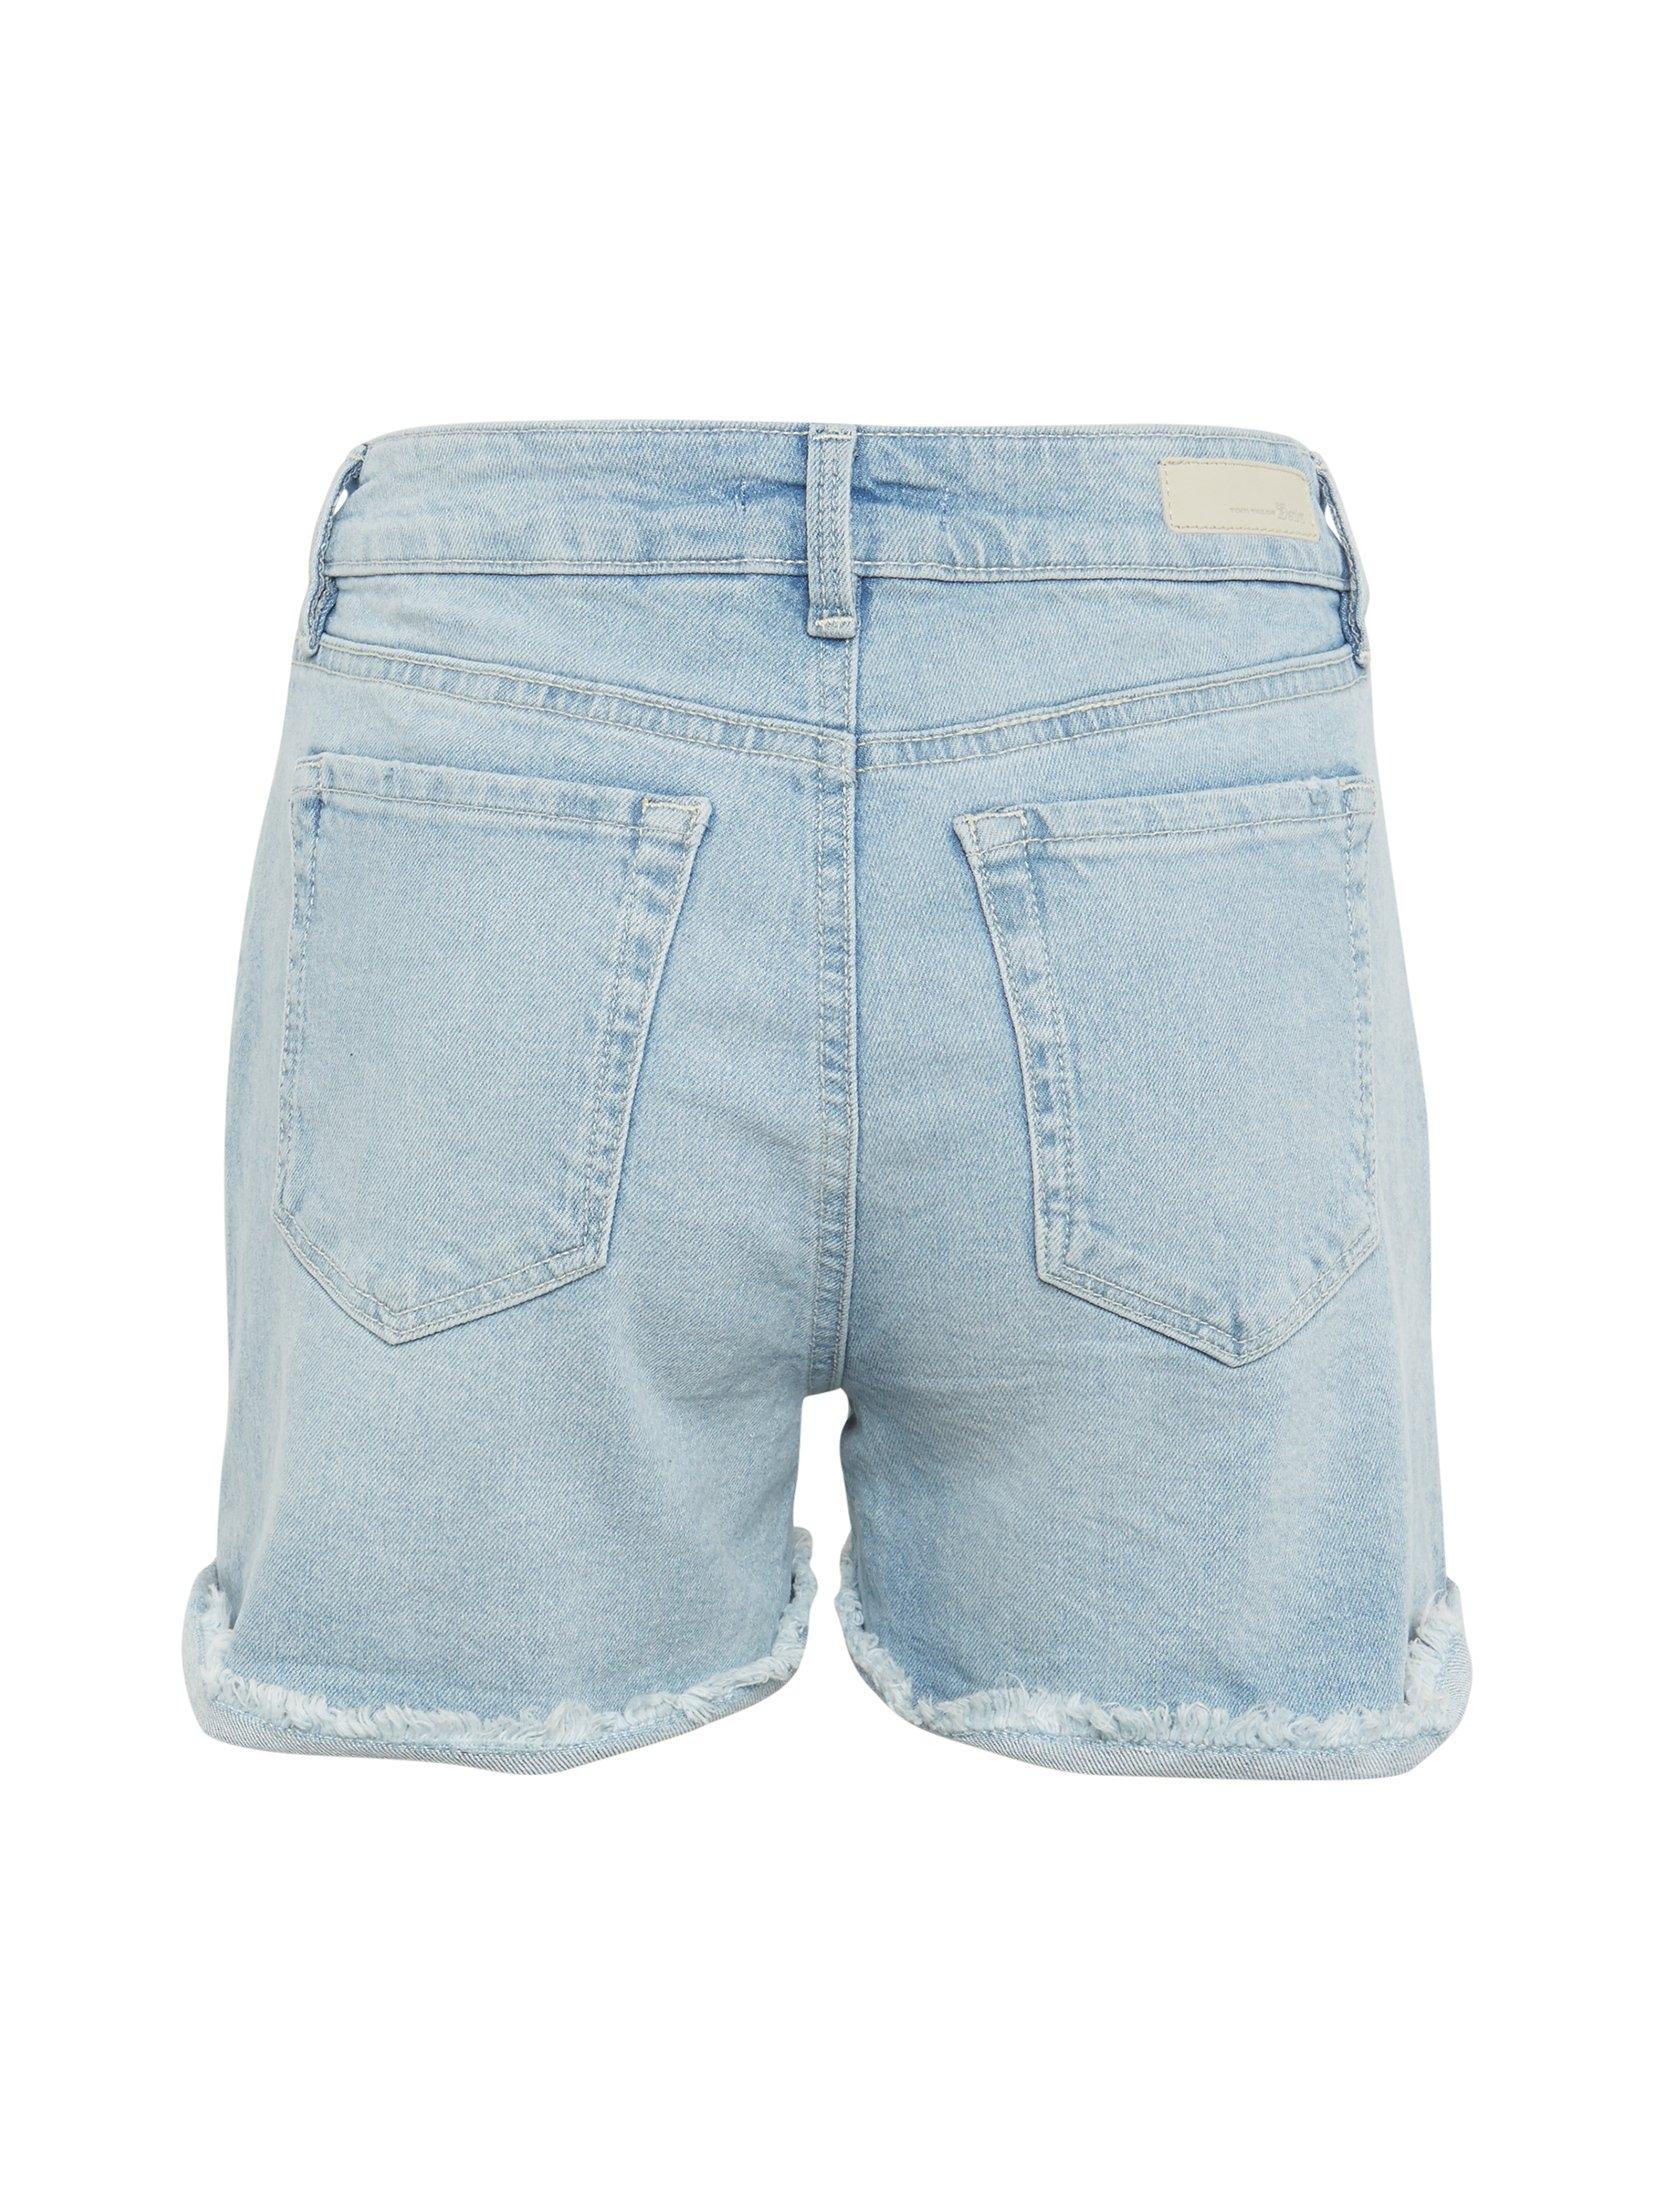 Tom Online In Denim Jeansshortjeansshort De Tailor Winkel strdChQ